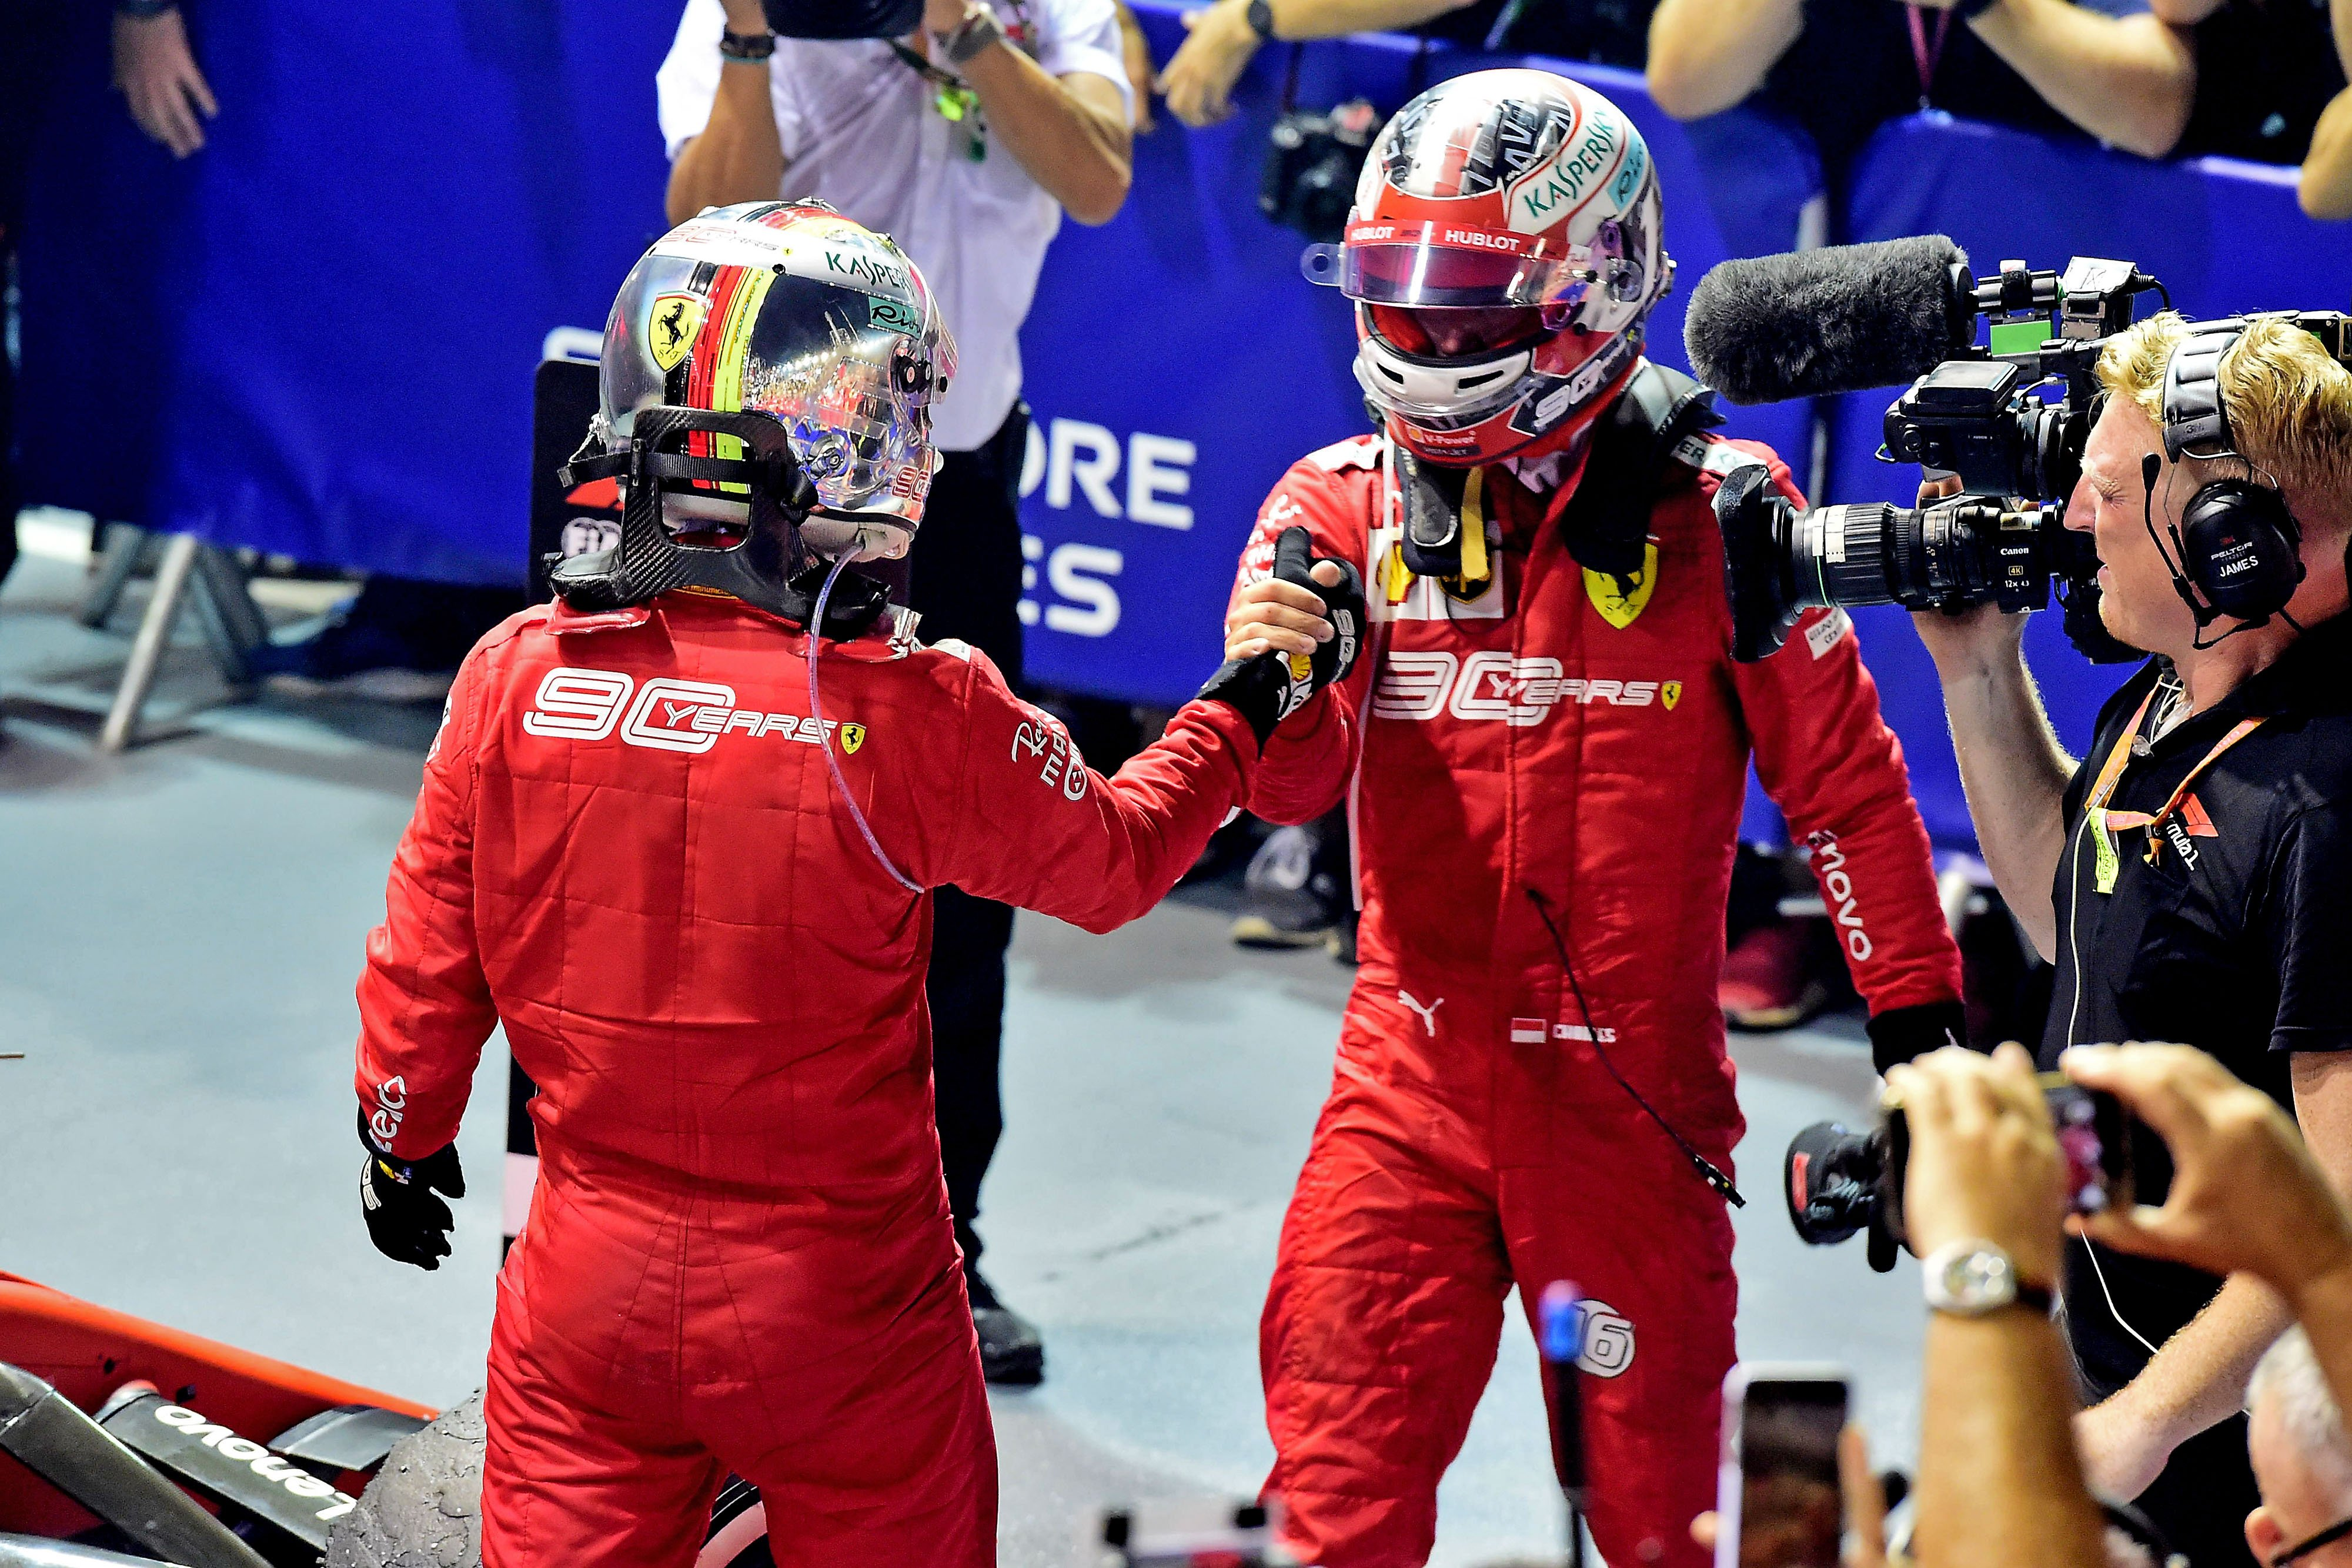 Imagen: Victoria de Ferrari. Imagen vía: Twitter oficial de la Scudería Ferrari